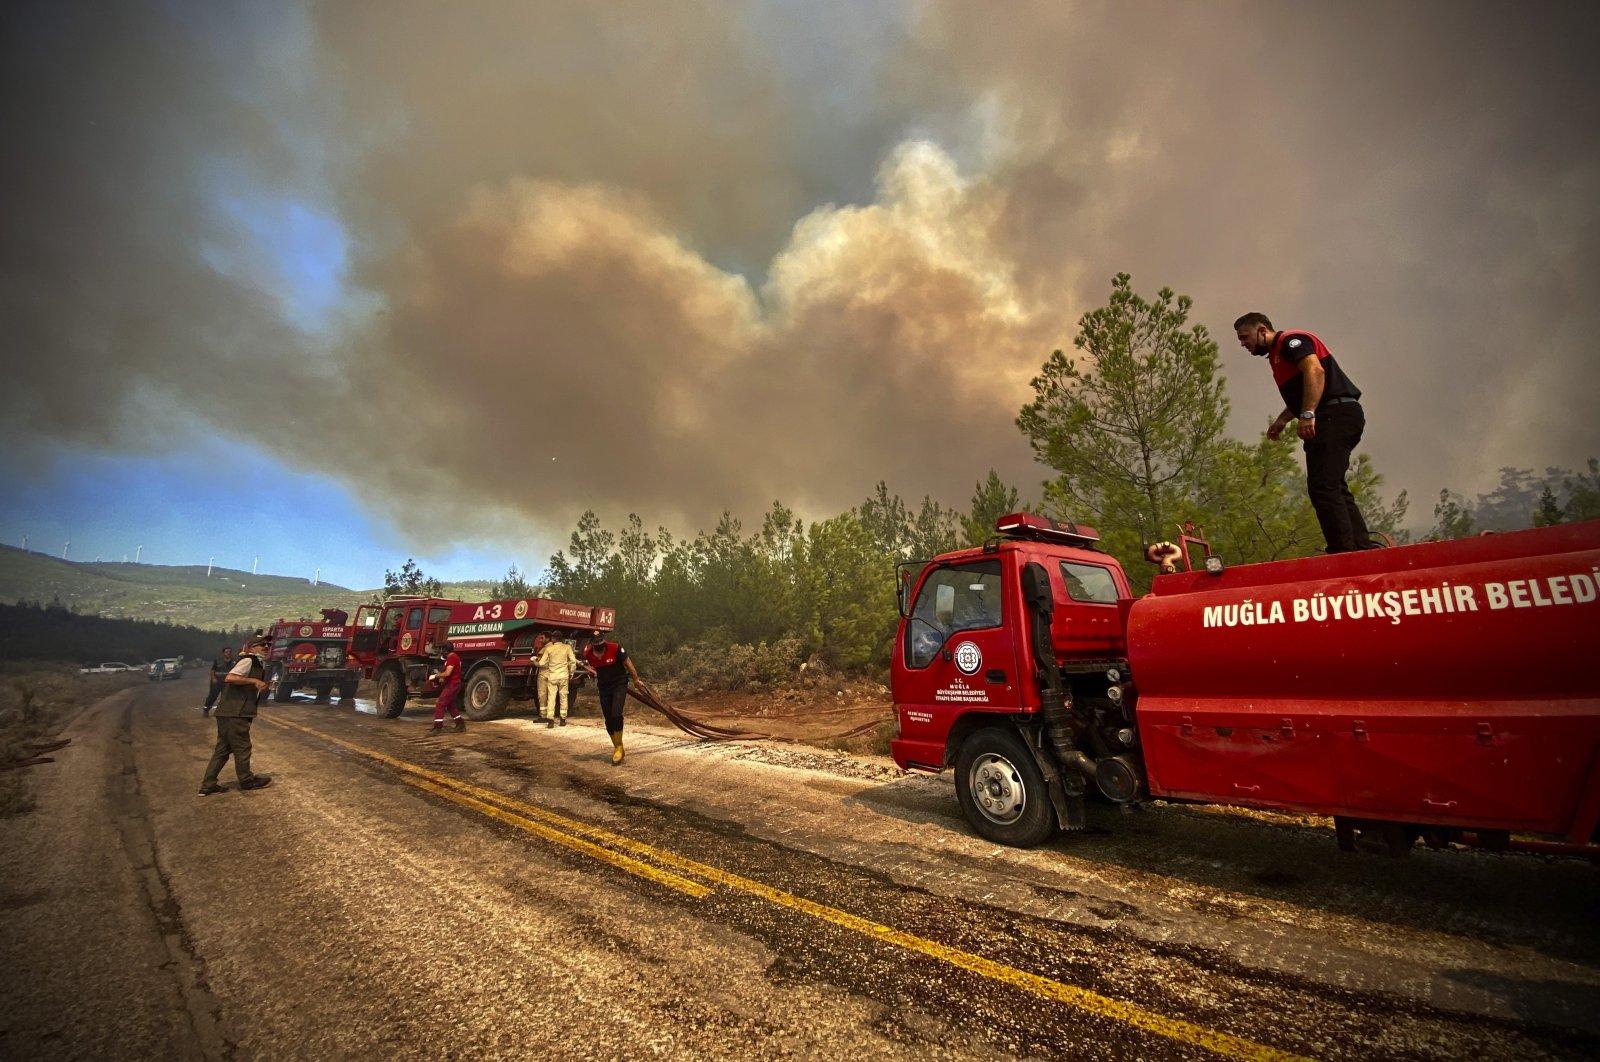 Firefighters work to extinguish an advancing fire, near Bodrum, Muğla, Turkey, Aug. 2, 2021. (AP Photo)